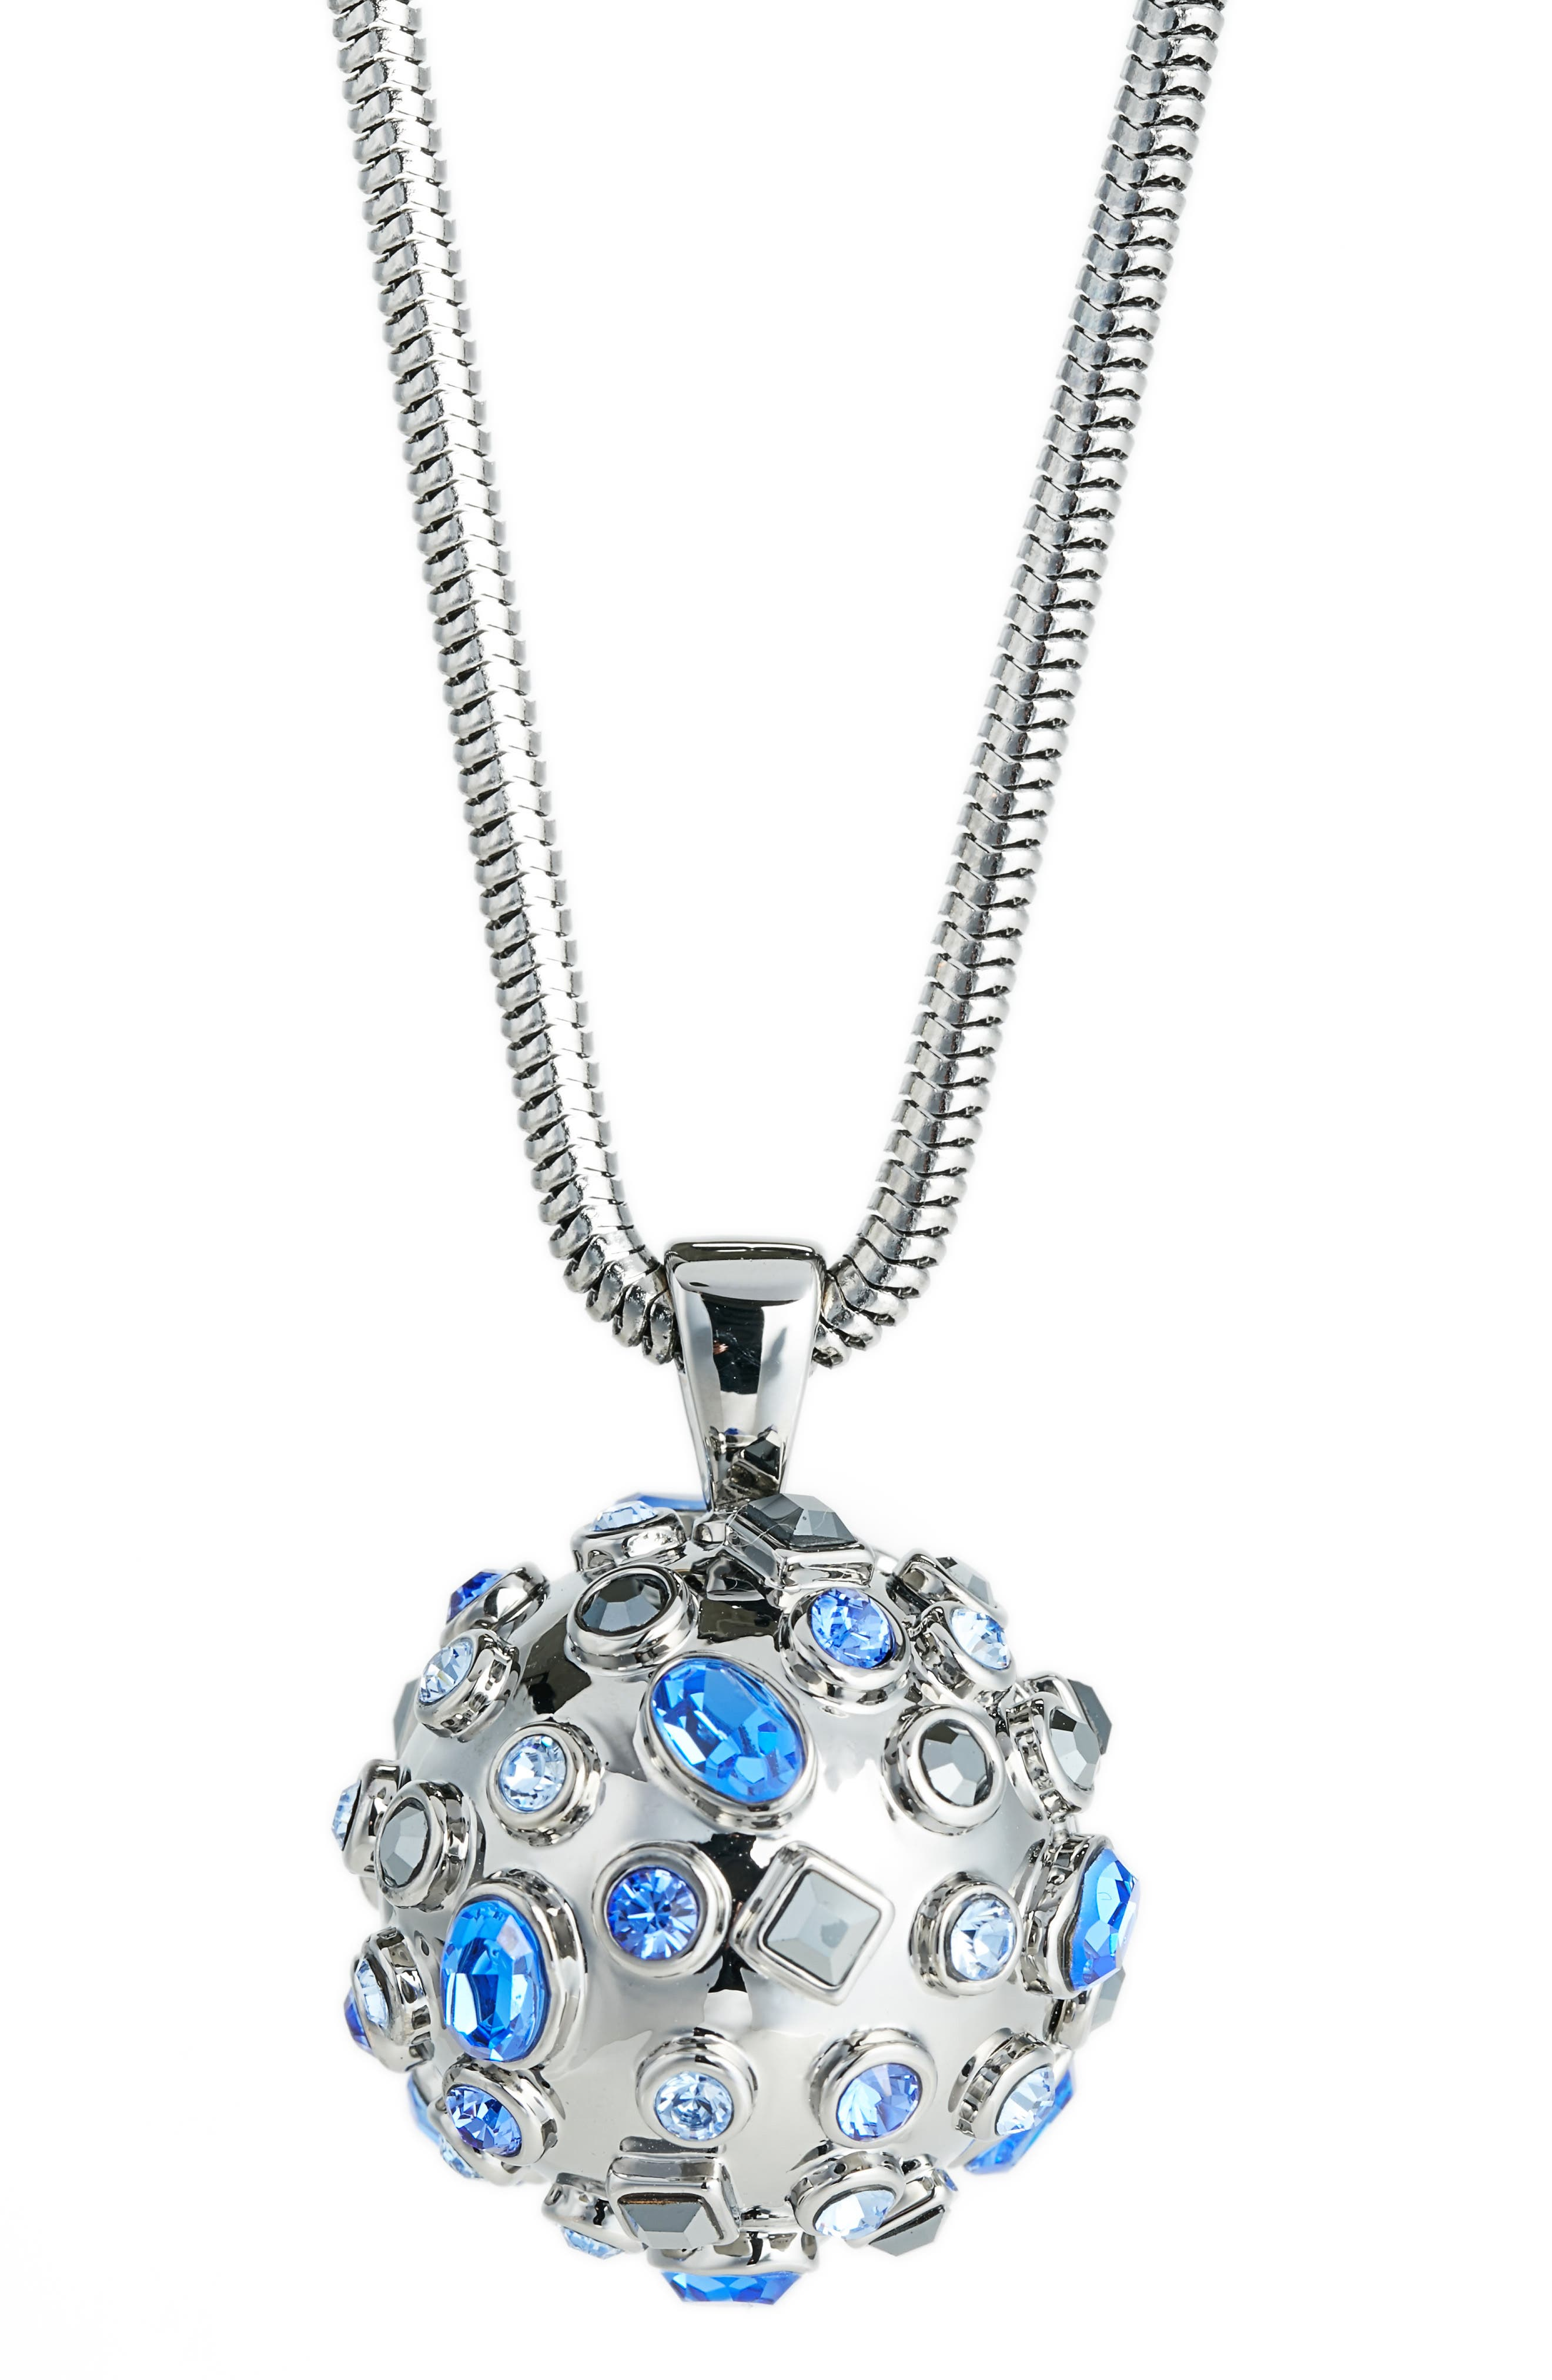 Alternate Image 1 Selected - St. John Collection Swarovski Crystal Pendant Necklace